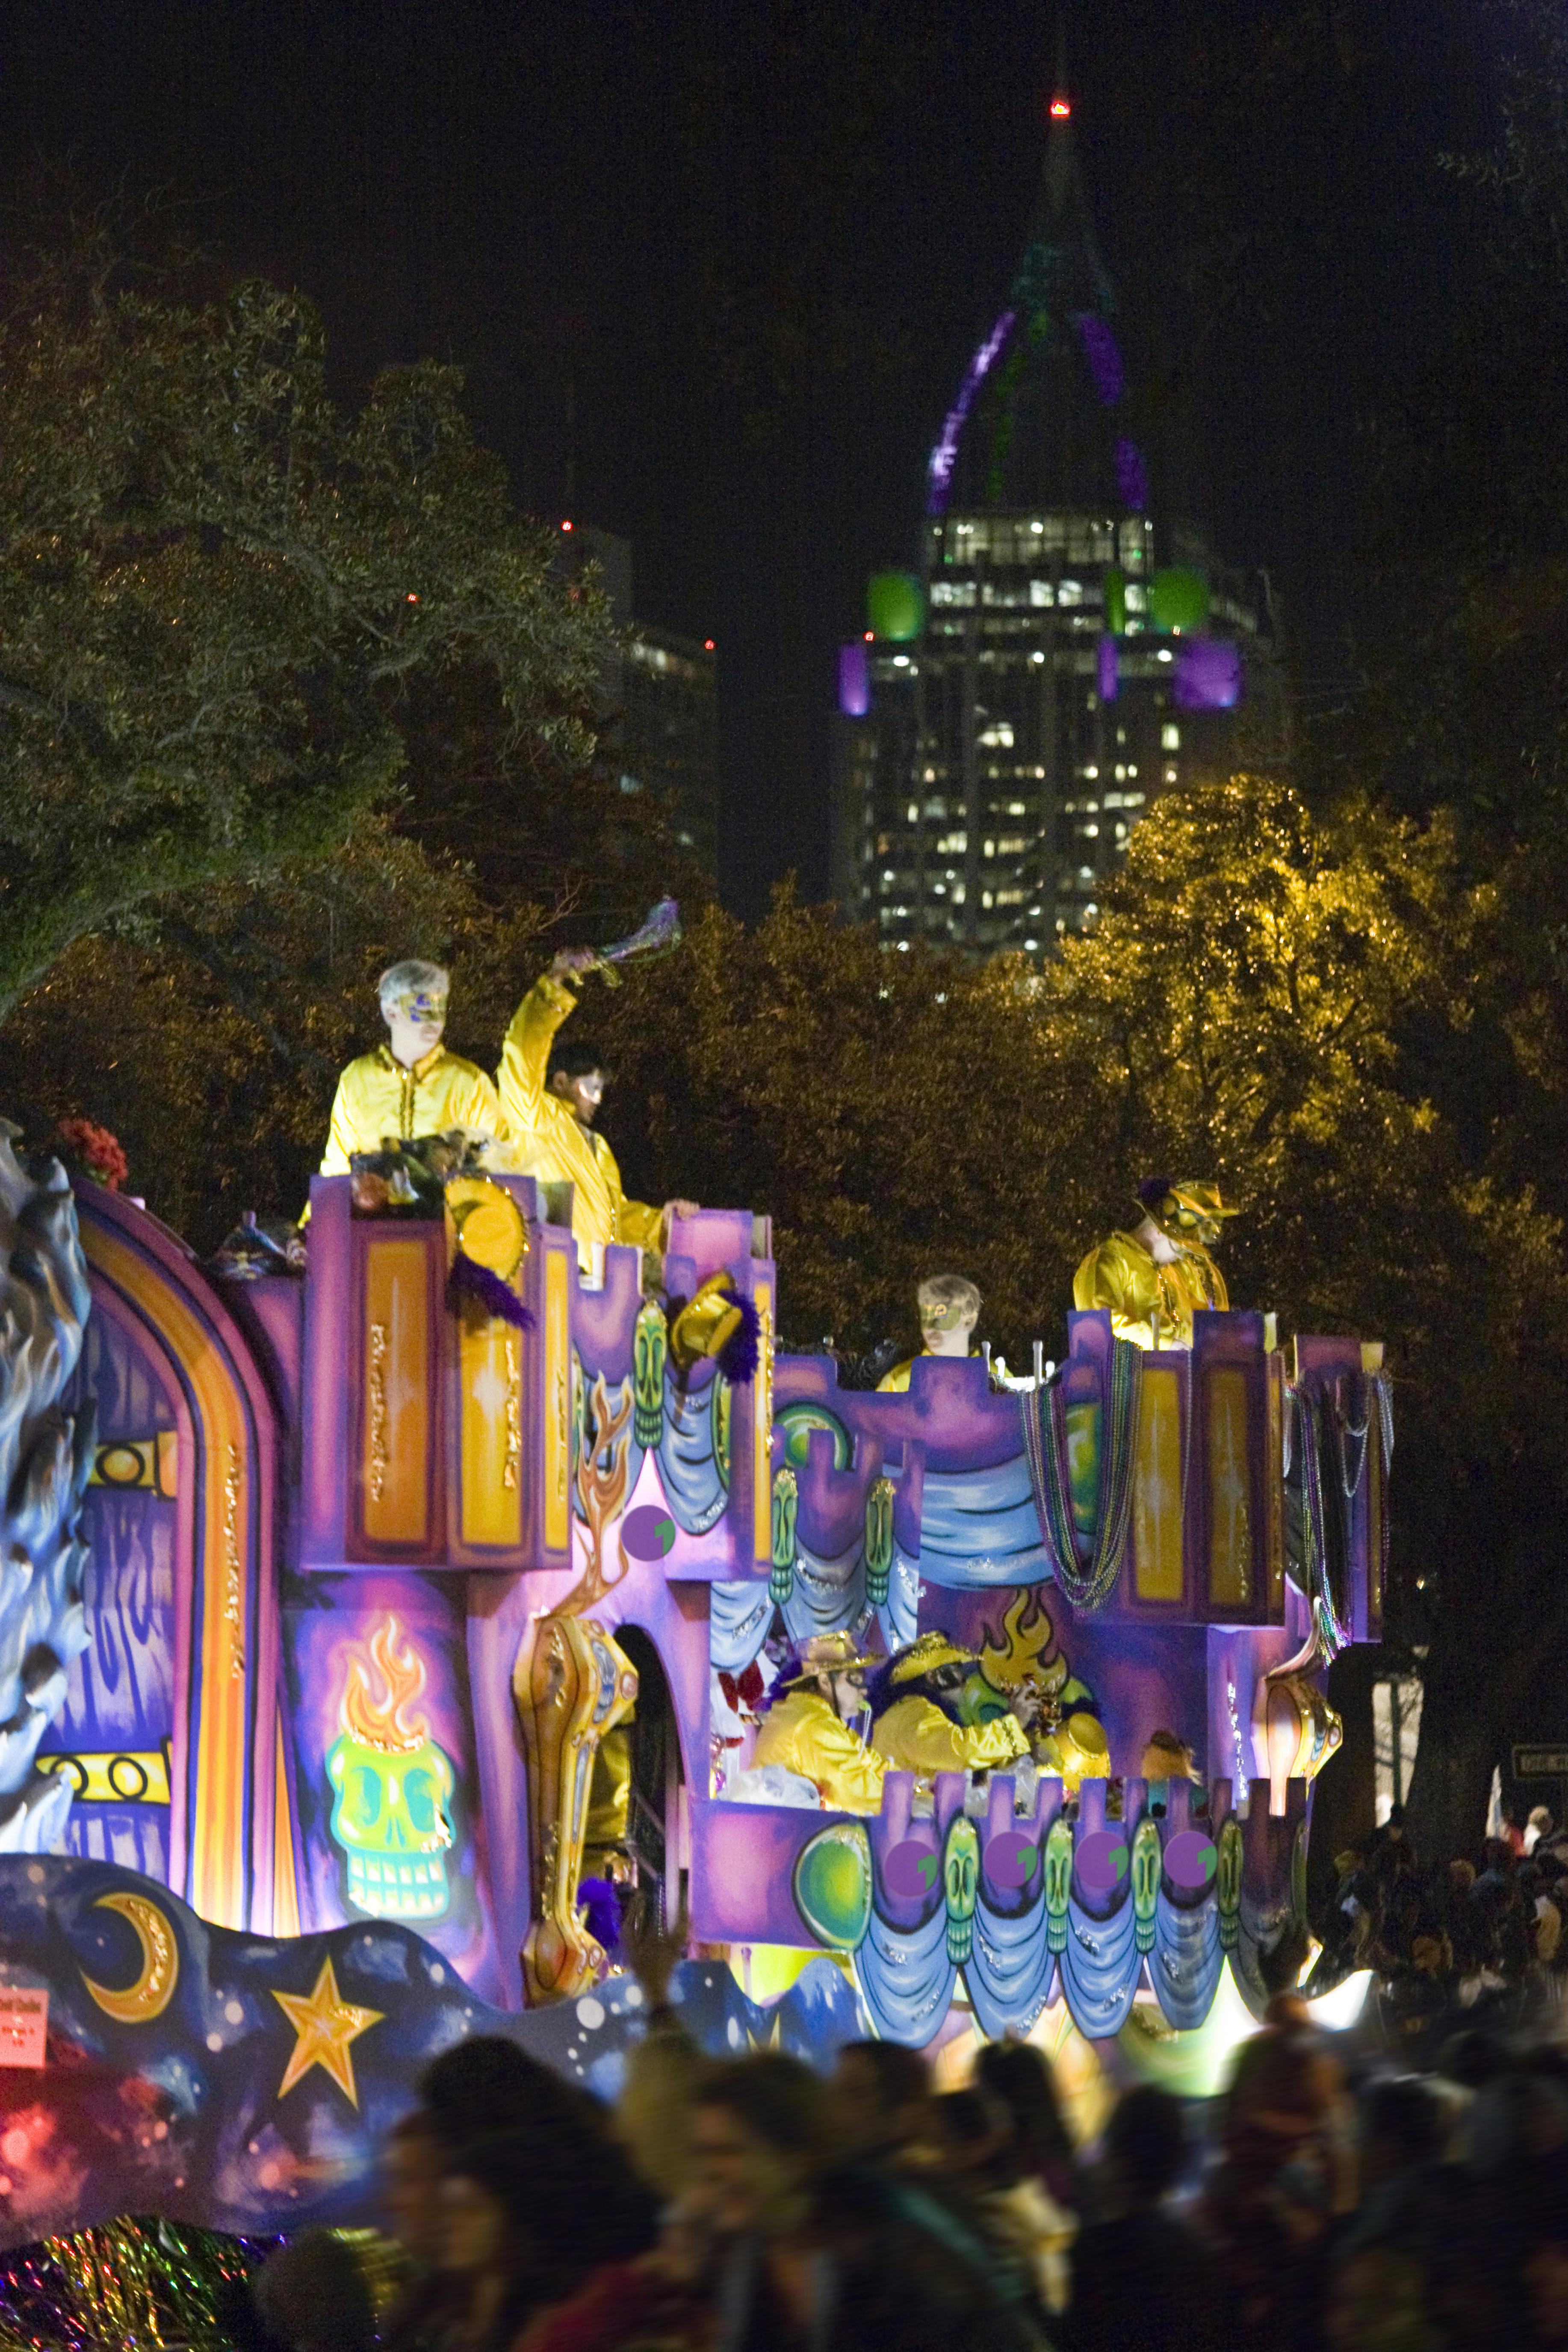 Mardi Gras Day in Mobile